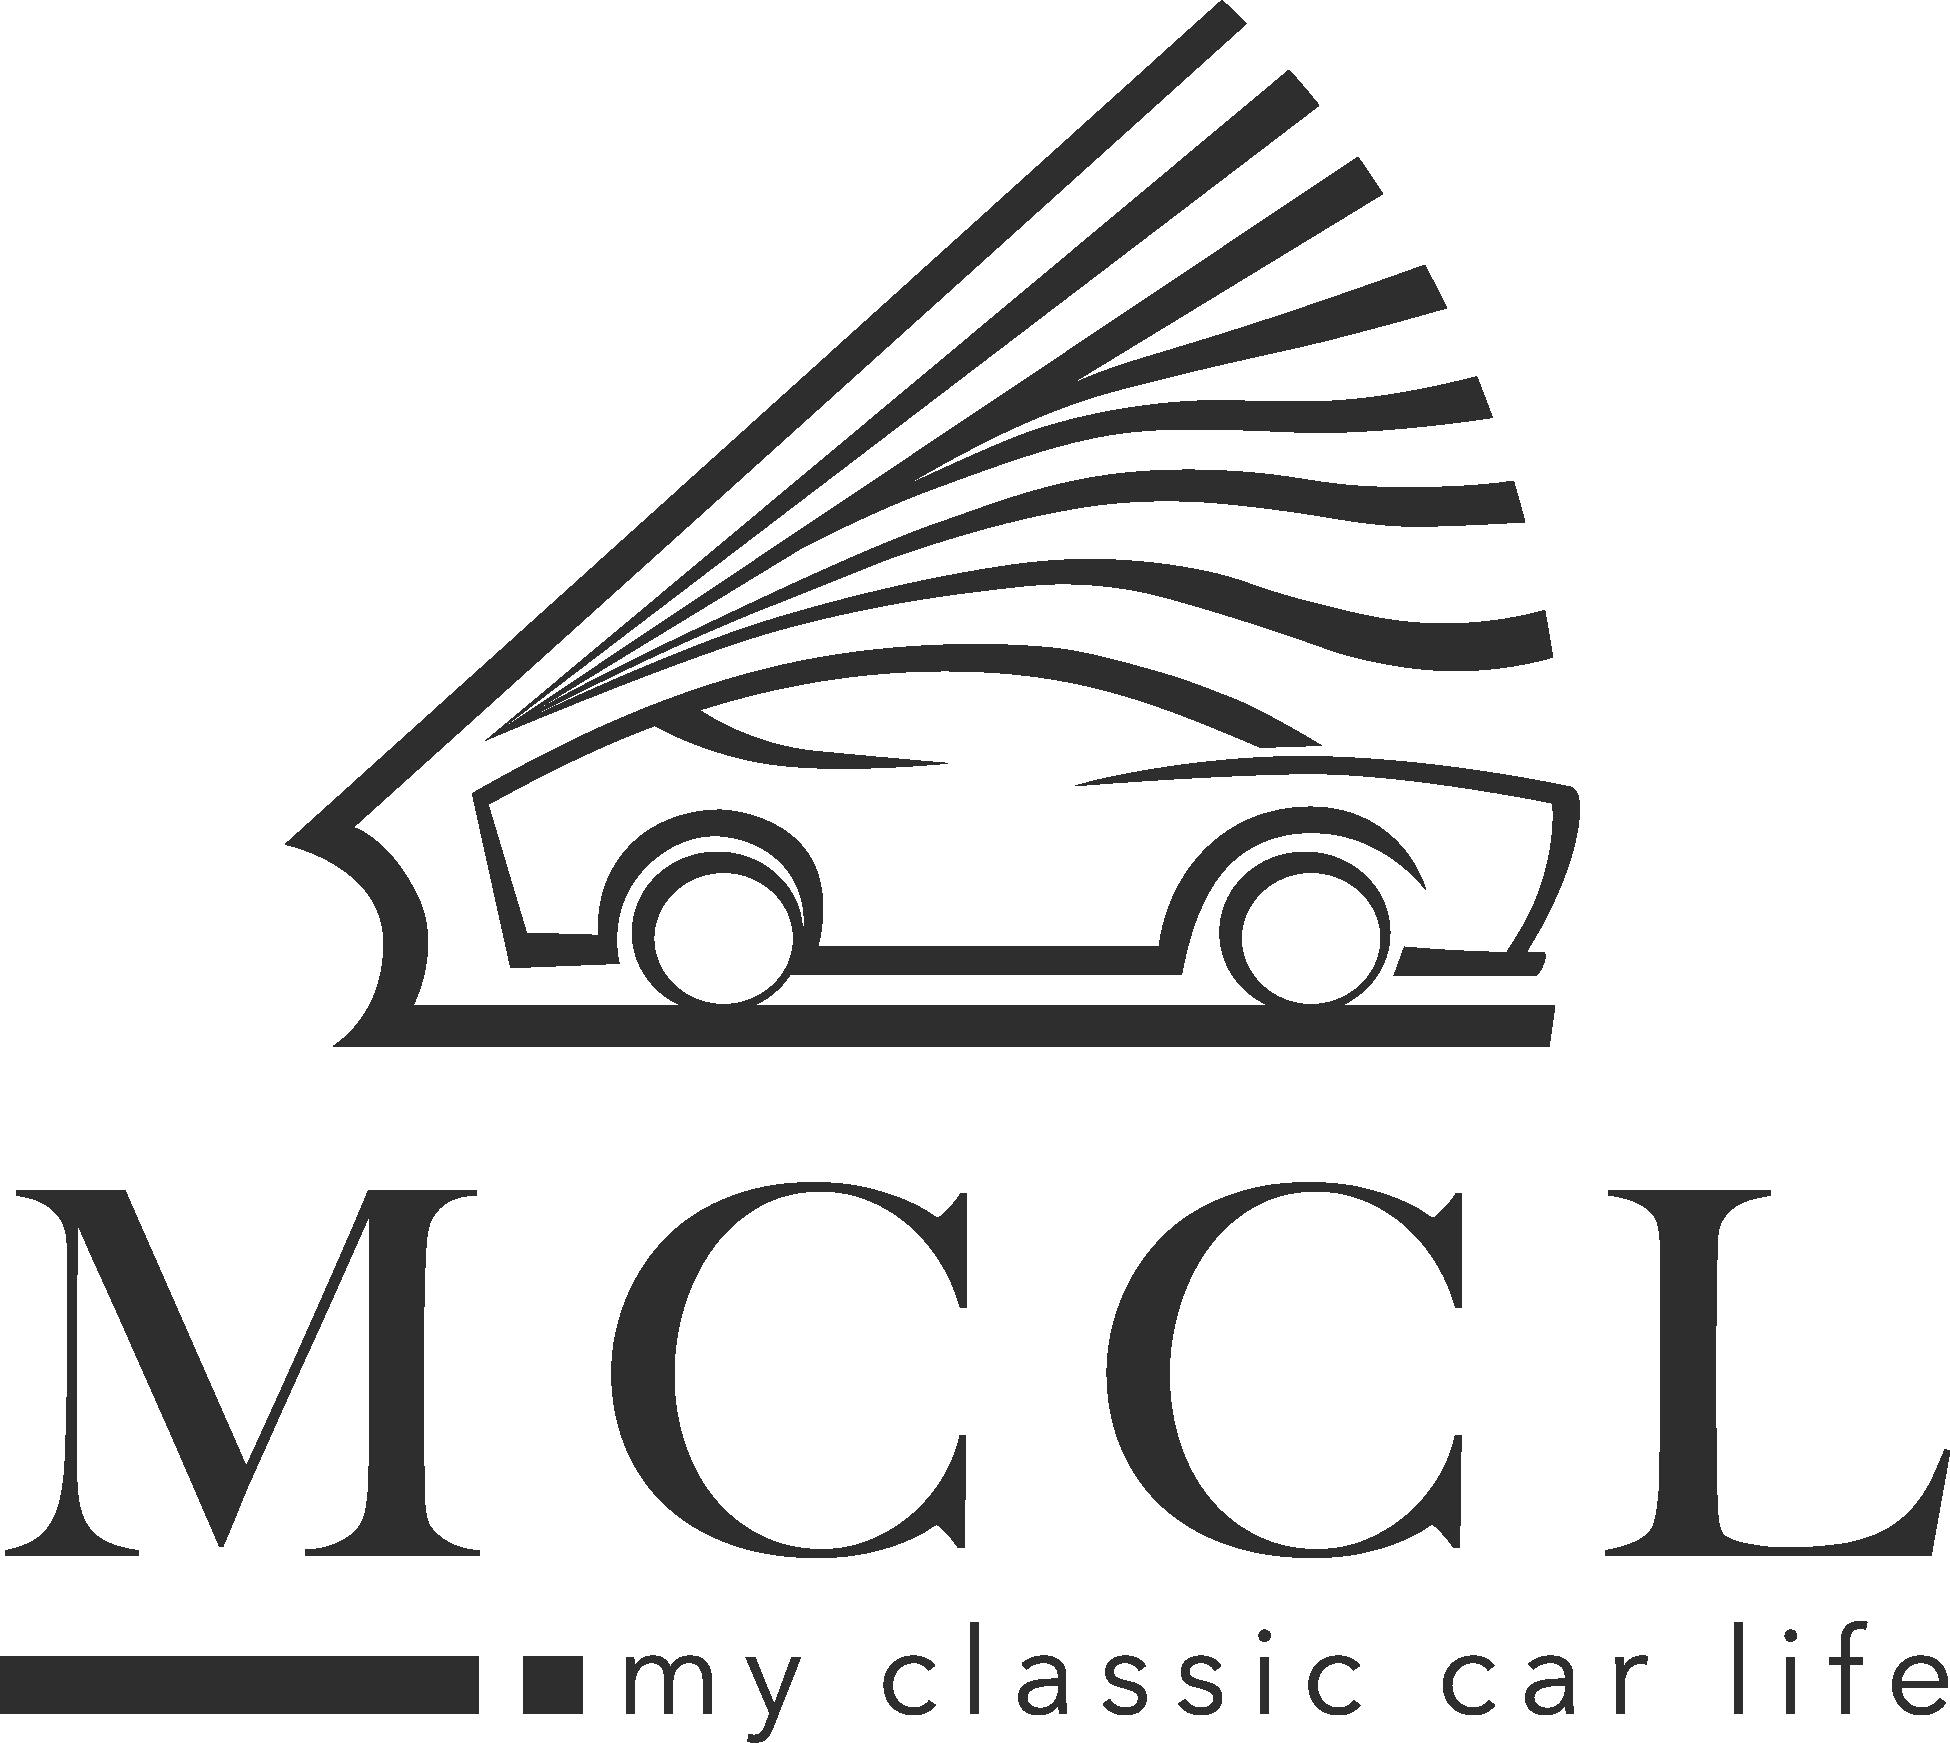 My Classic Car Life